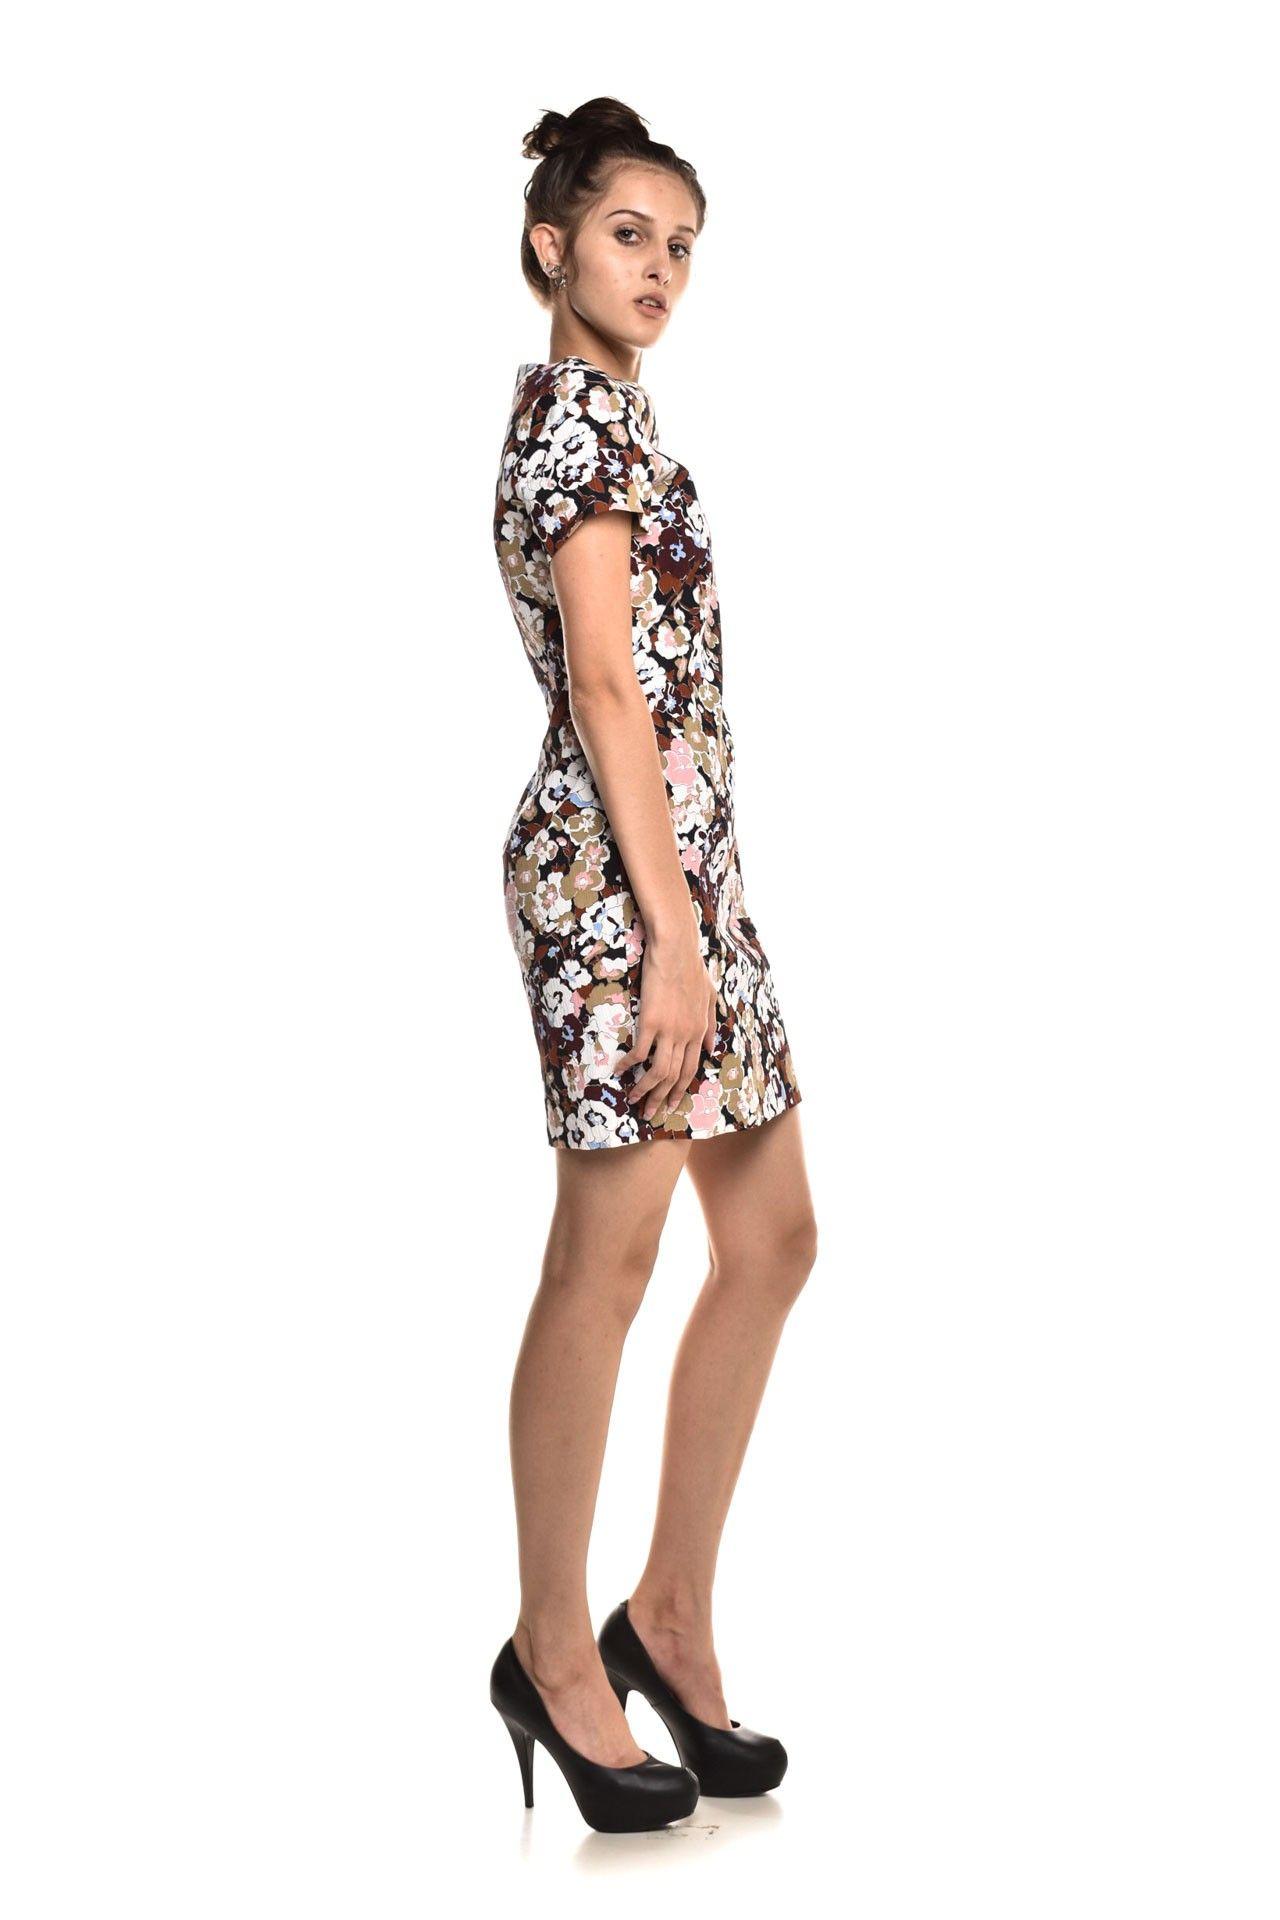 Gant - Vestido Floral Primavera - Foto 3